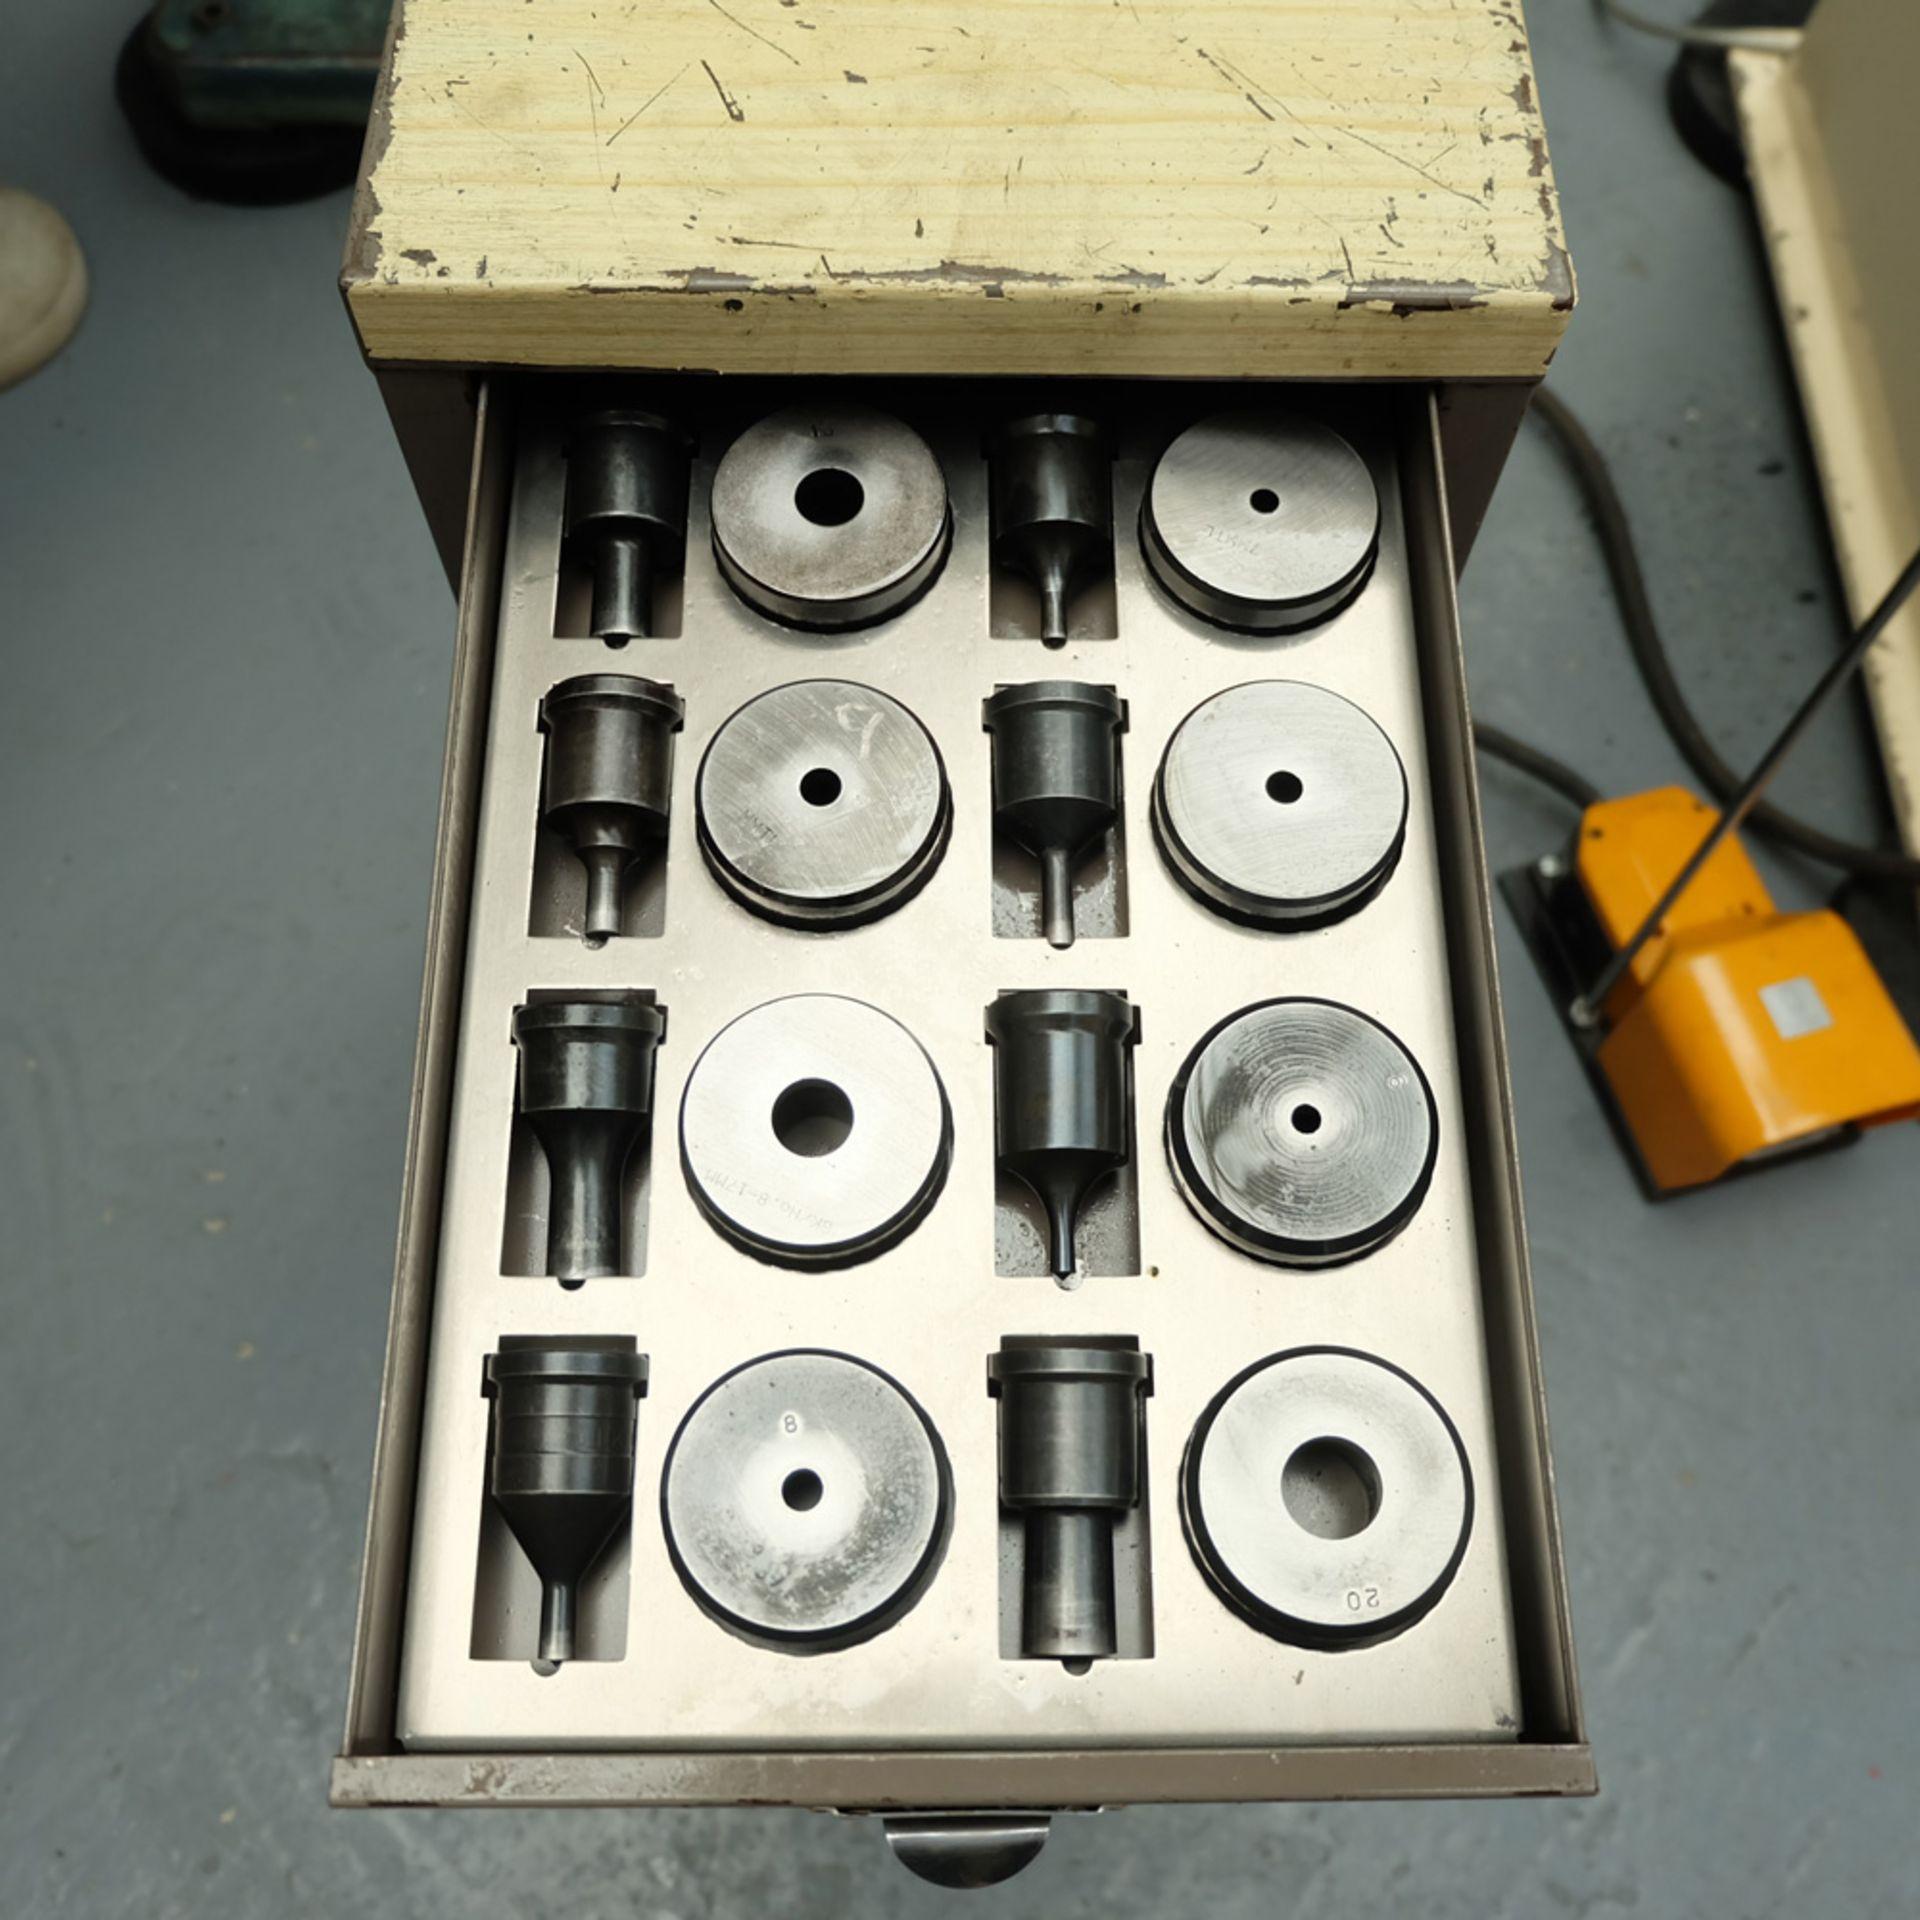 GEKA Model HYD 80/A Universal Steelworker - Image 16 of 21